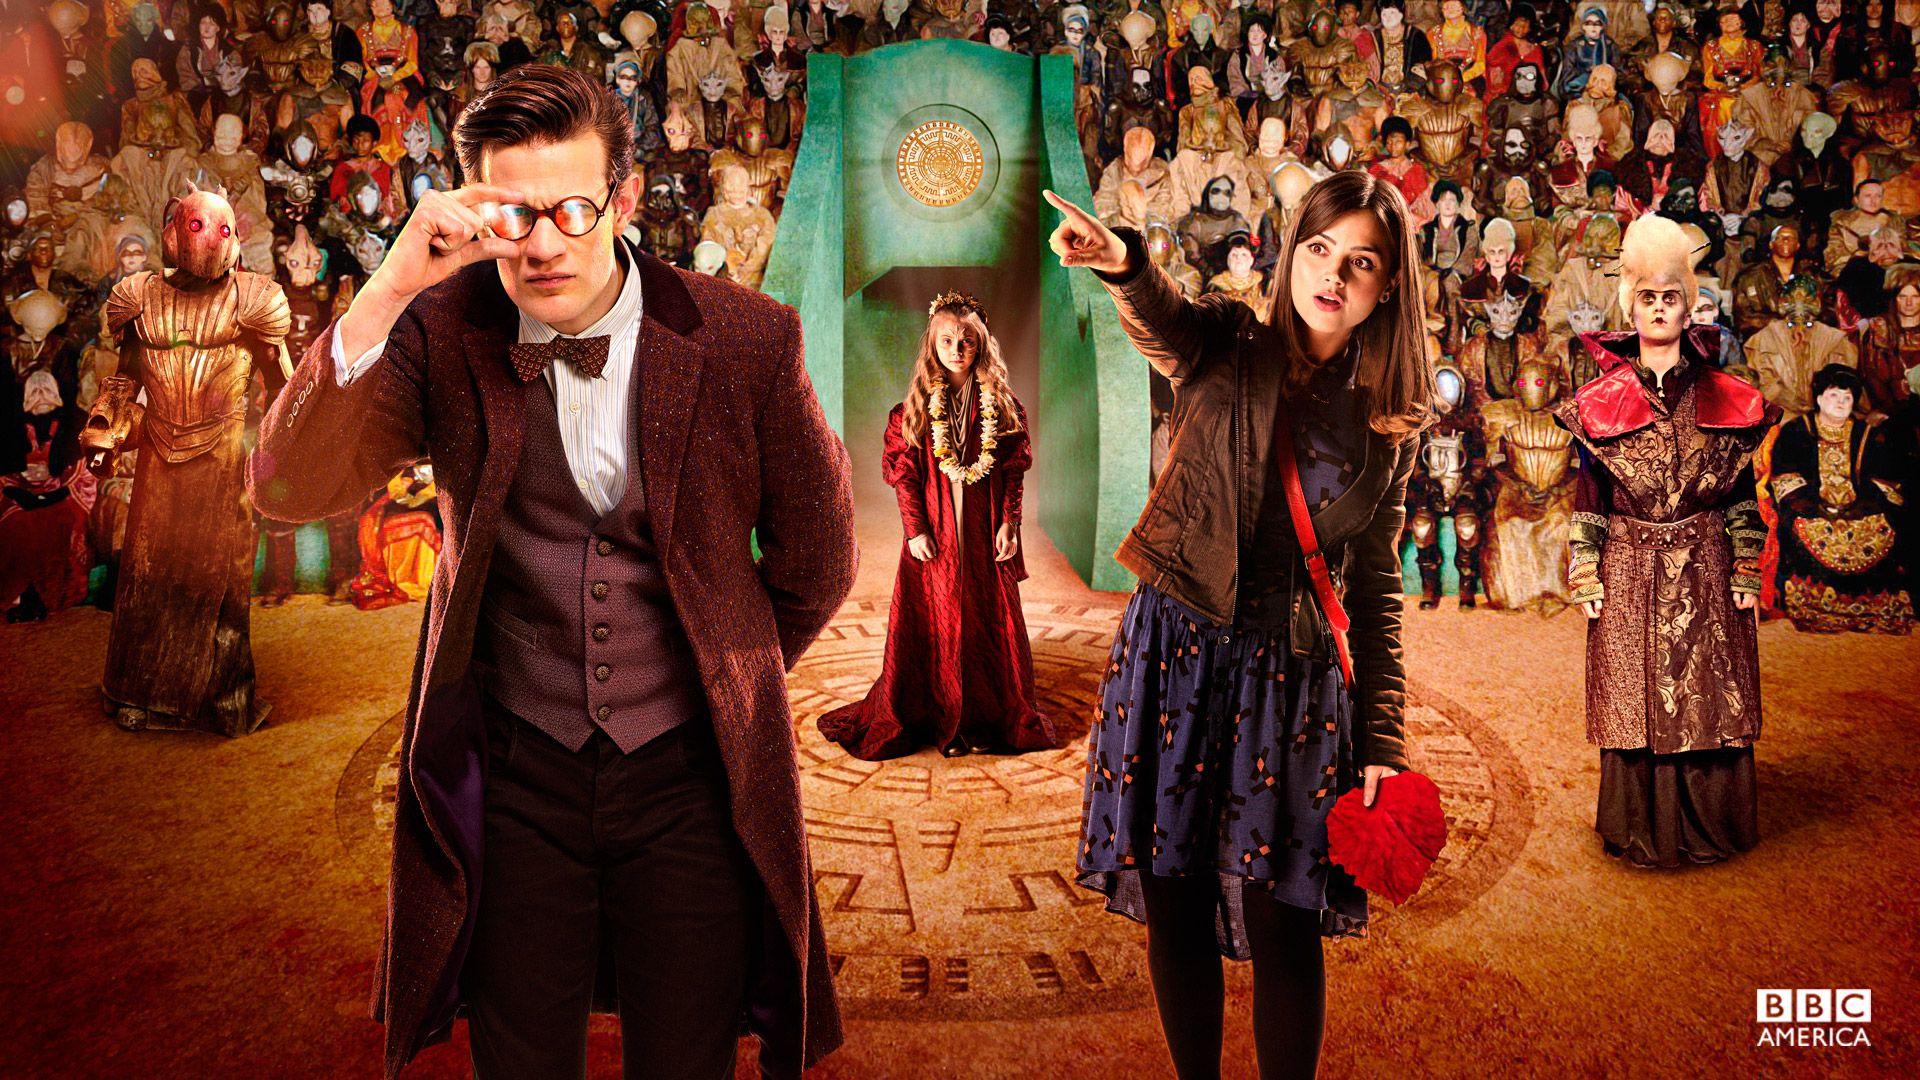 Doctor Who Season 7 Wallpaper Doctor Who Aka The Love Of My Life